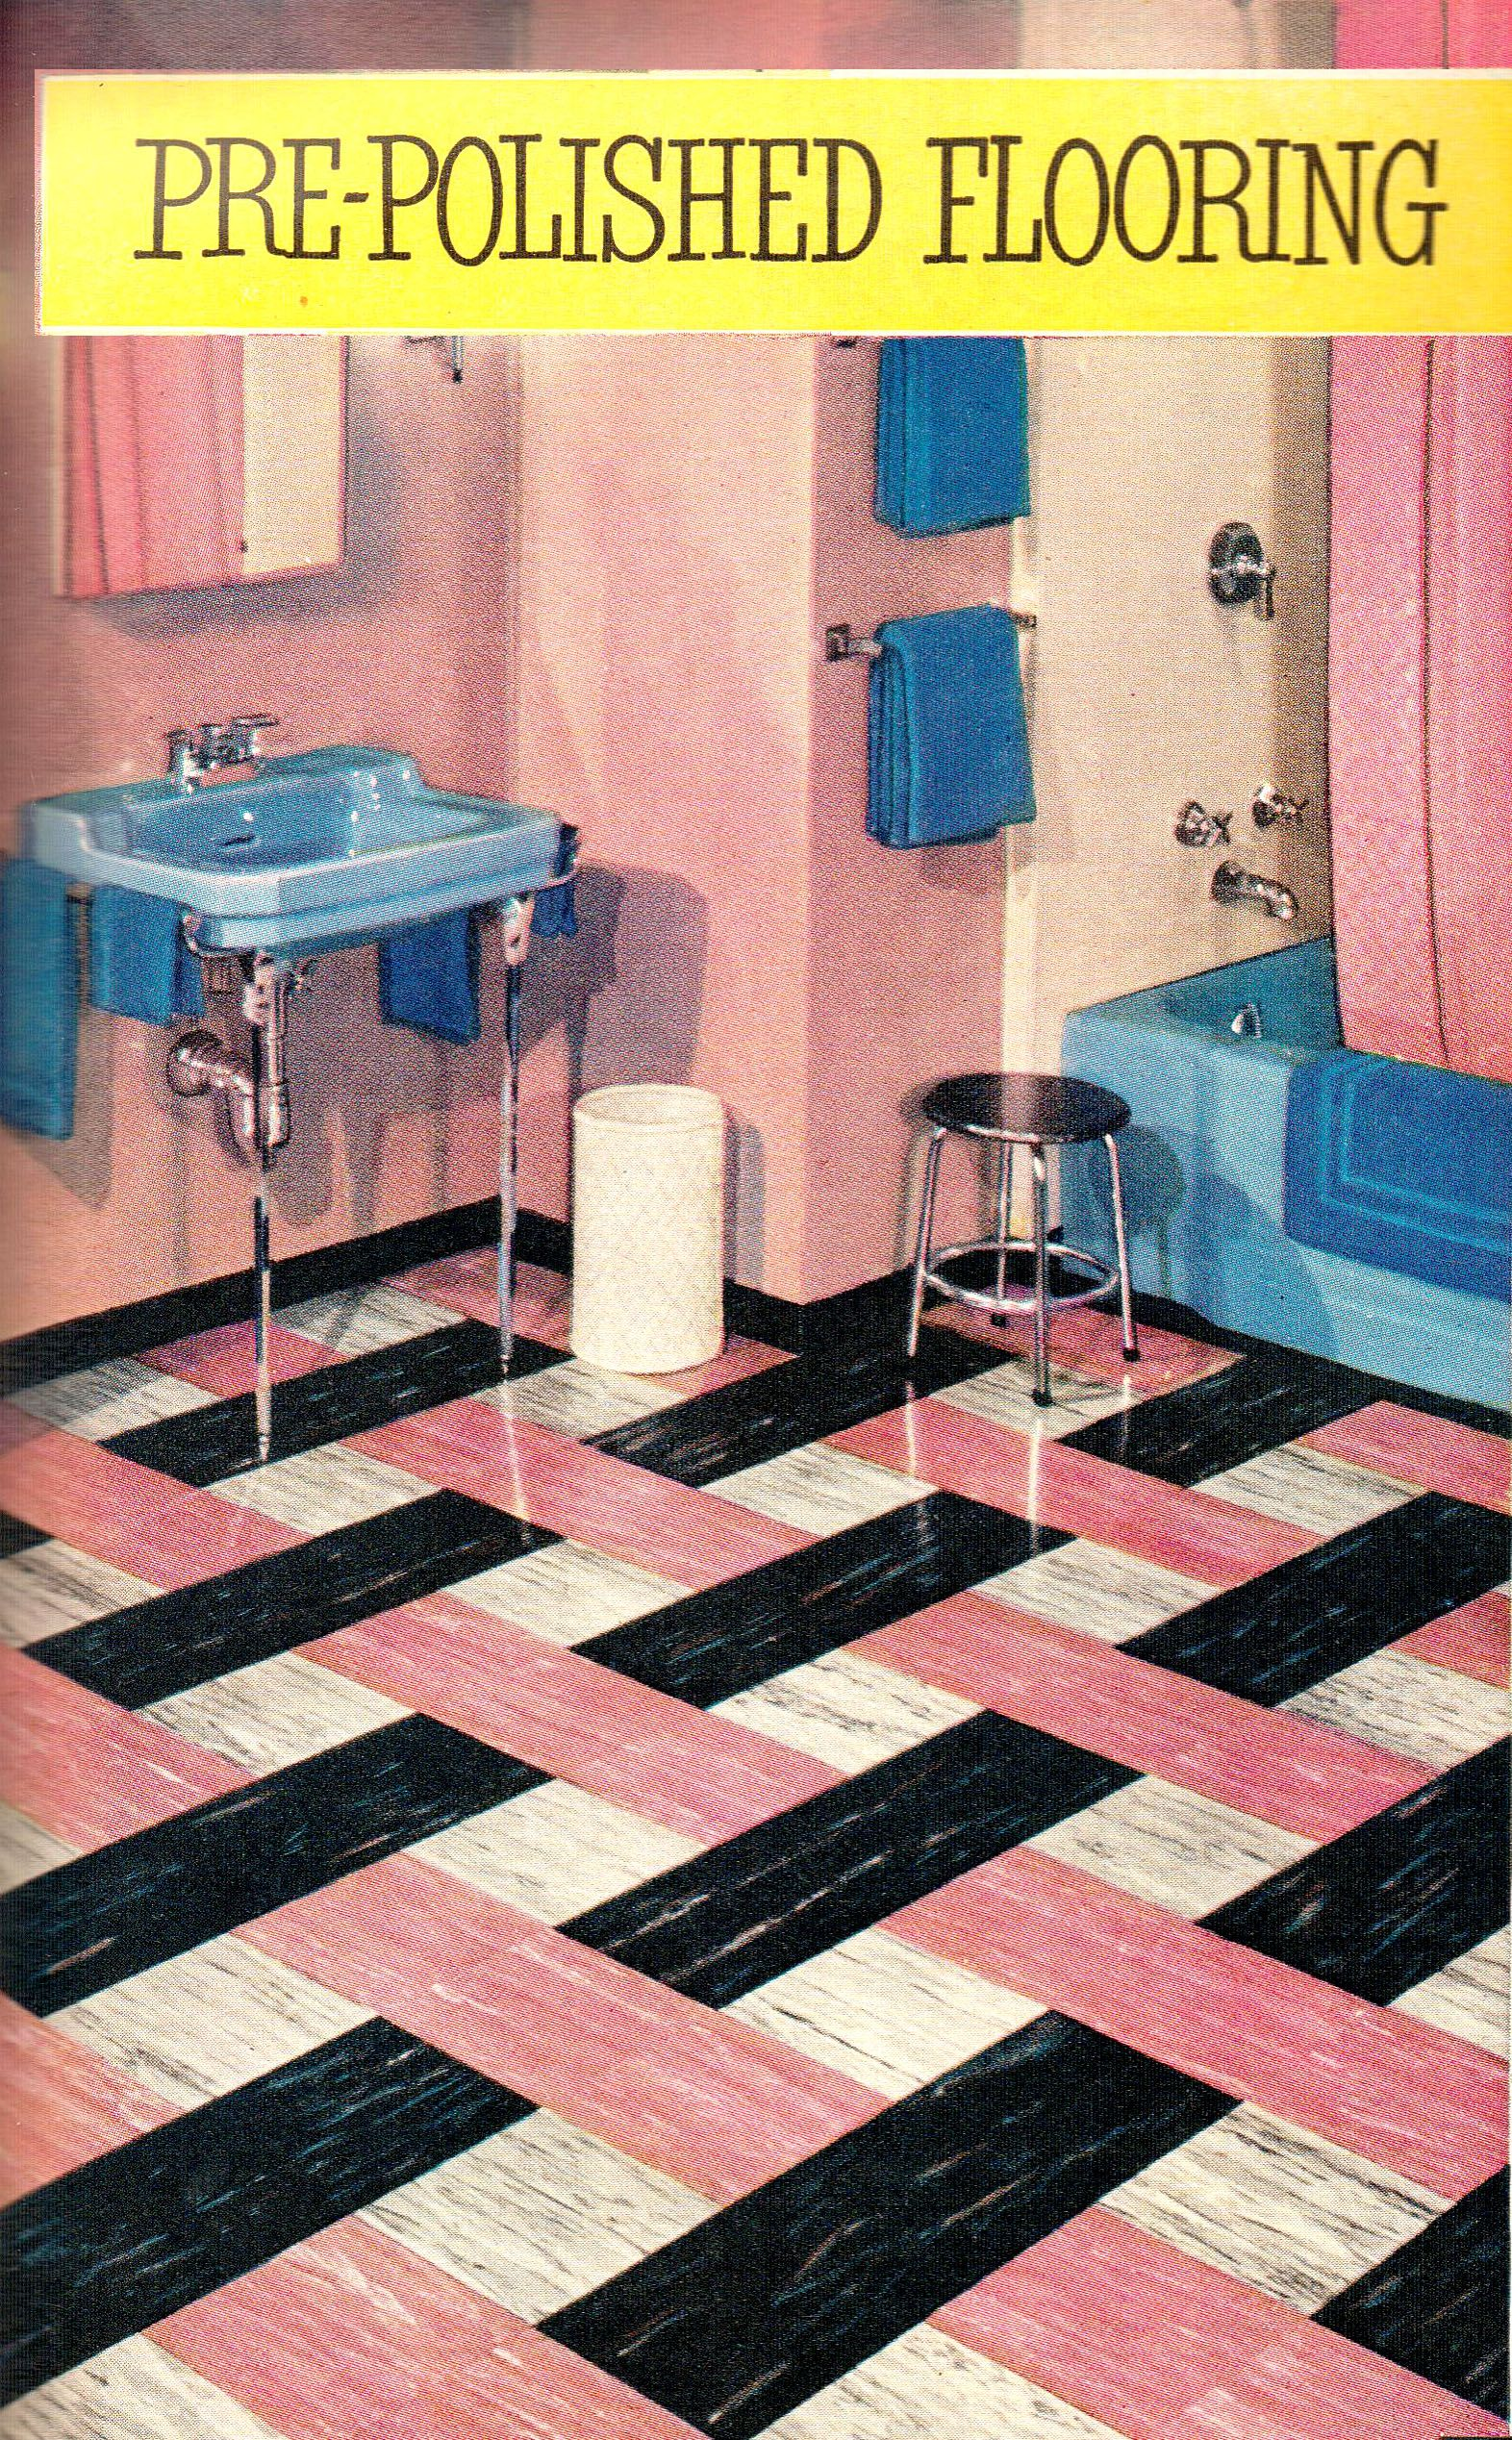 Mid century bathroom featuring vinyl flooring by Good Year